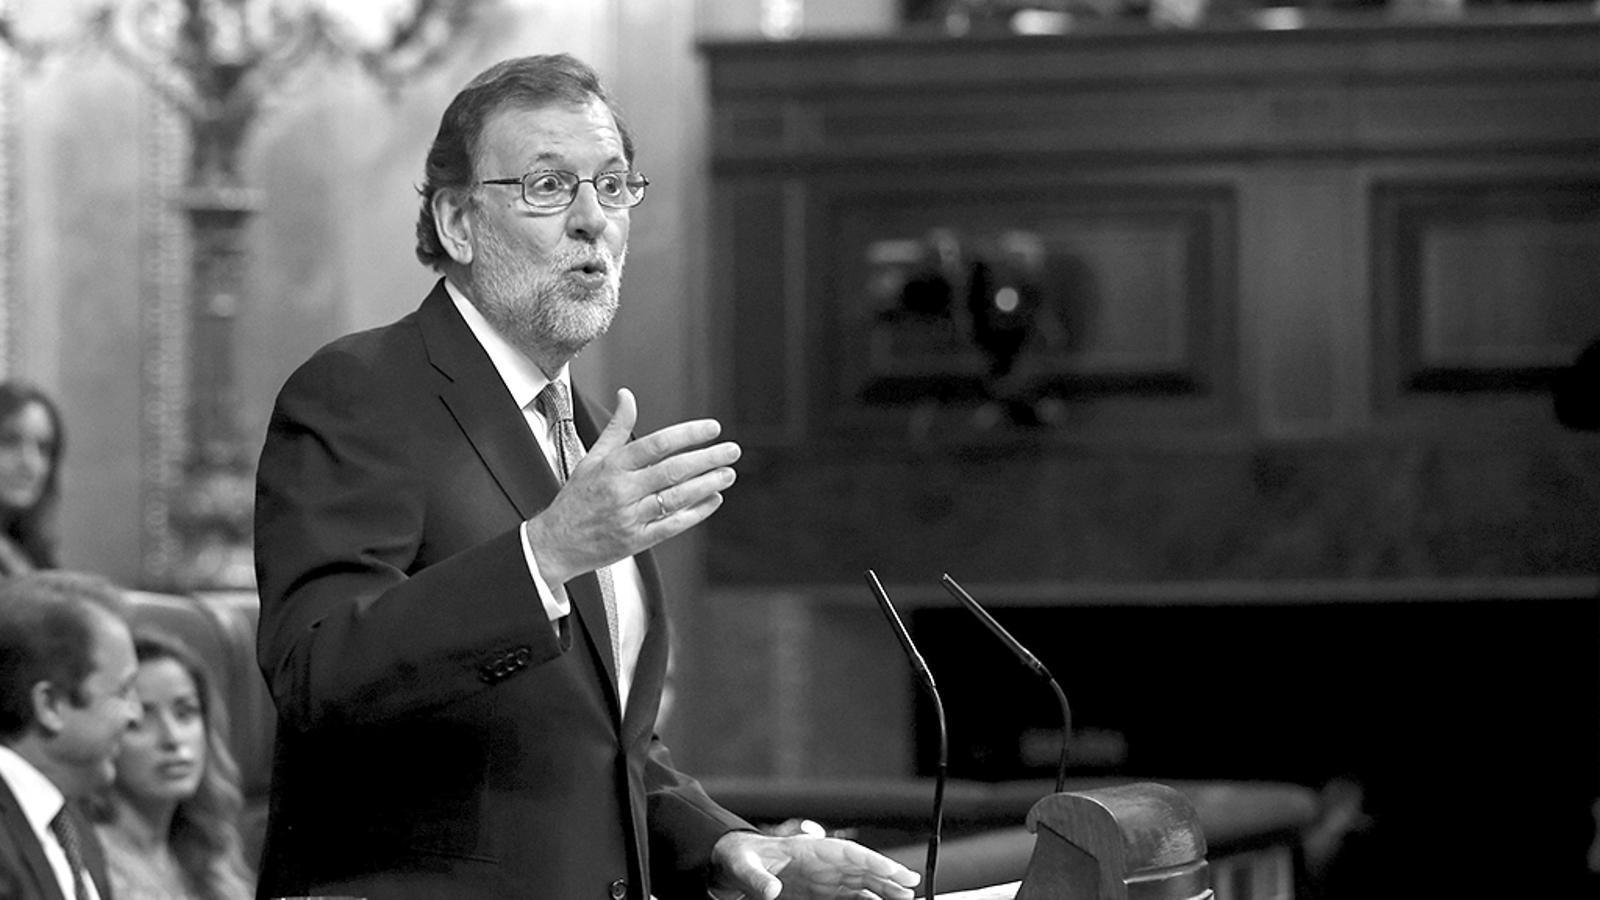 L'anàlisi d'Antoni Bassas: 'Rajoy: Si yo soy malo, ¿usted es pésimo?'